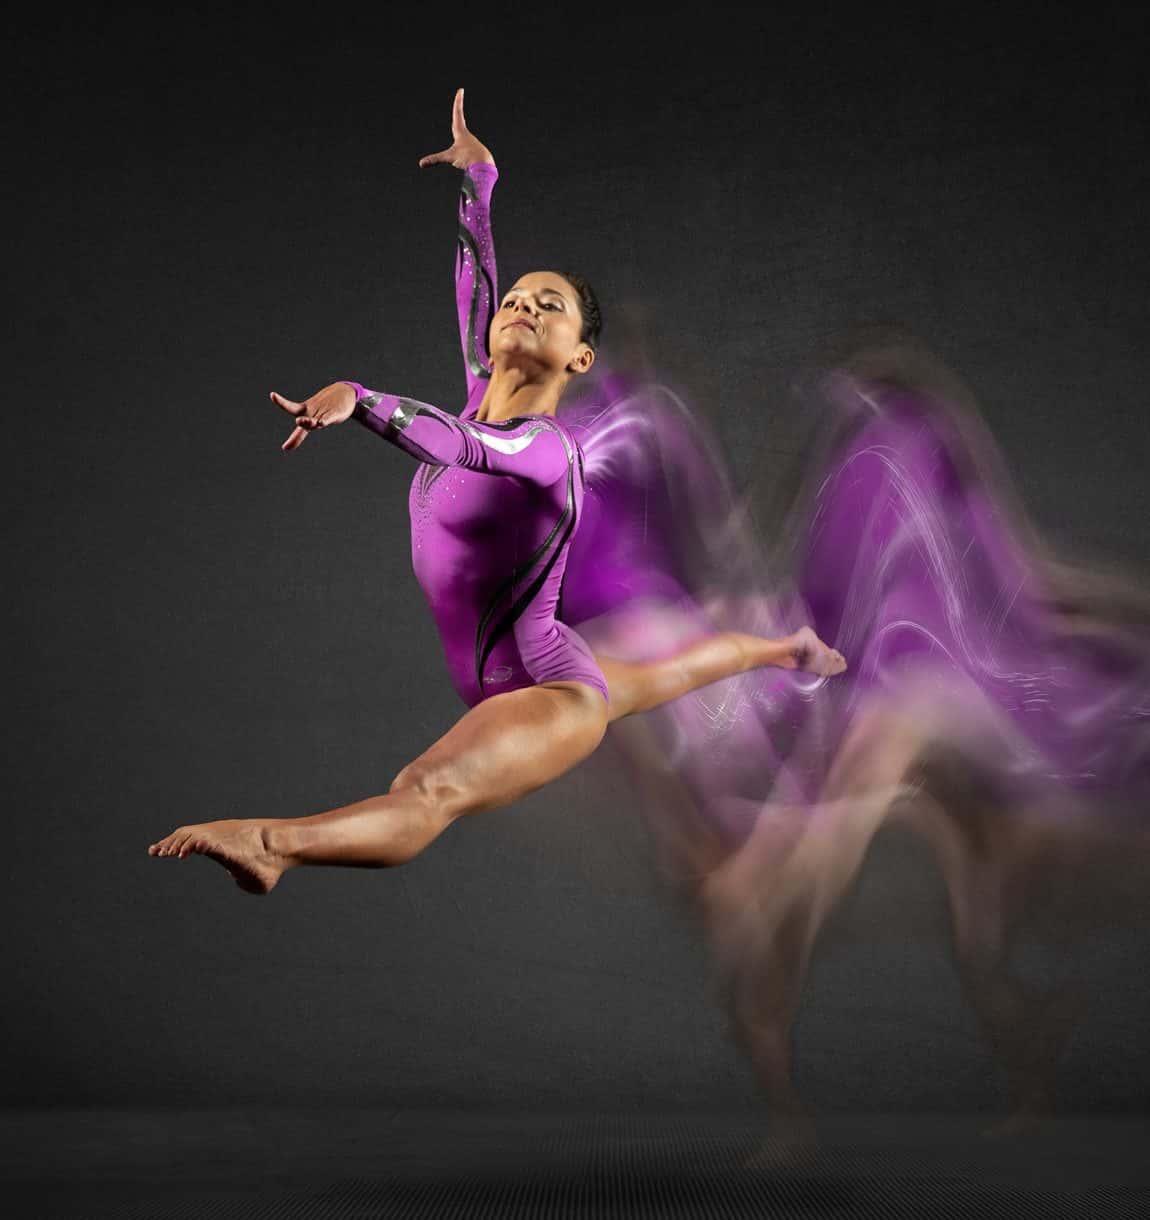 gymnast-purple-leotard-movement